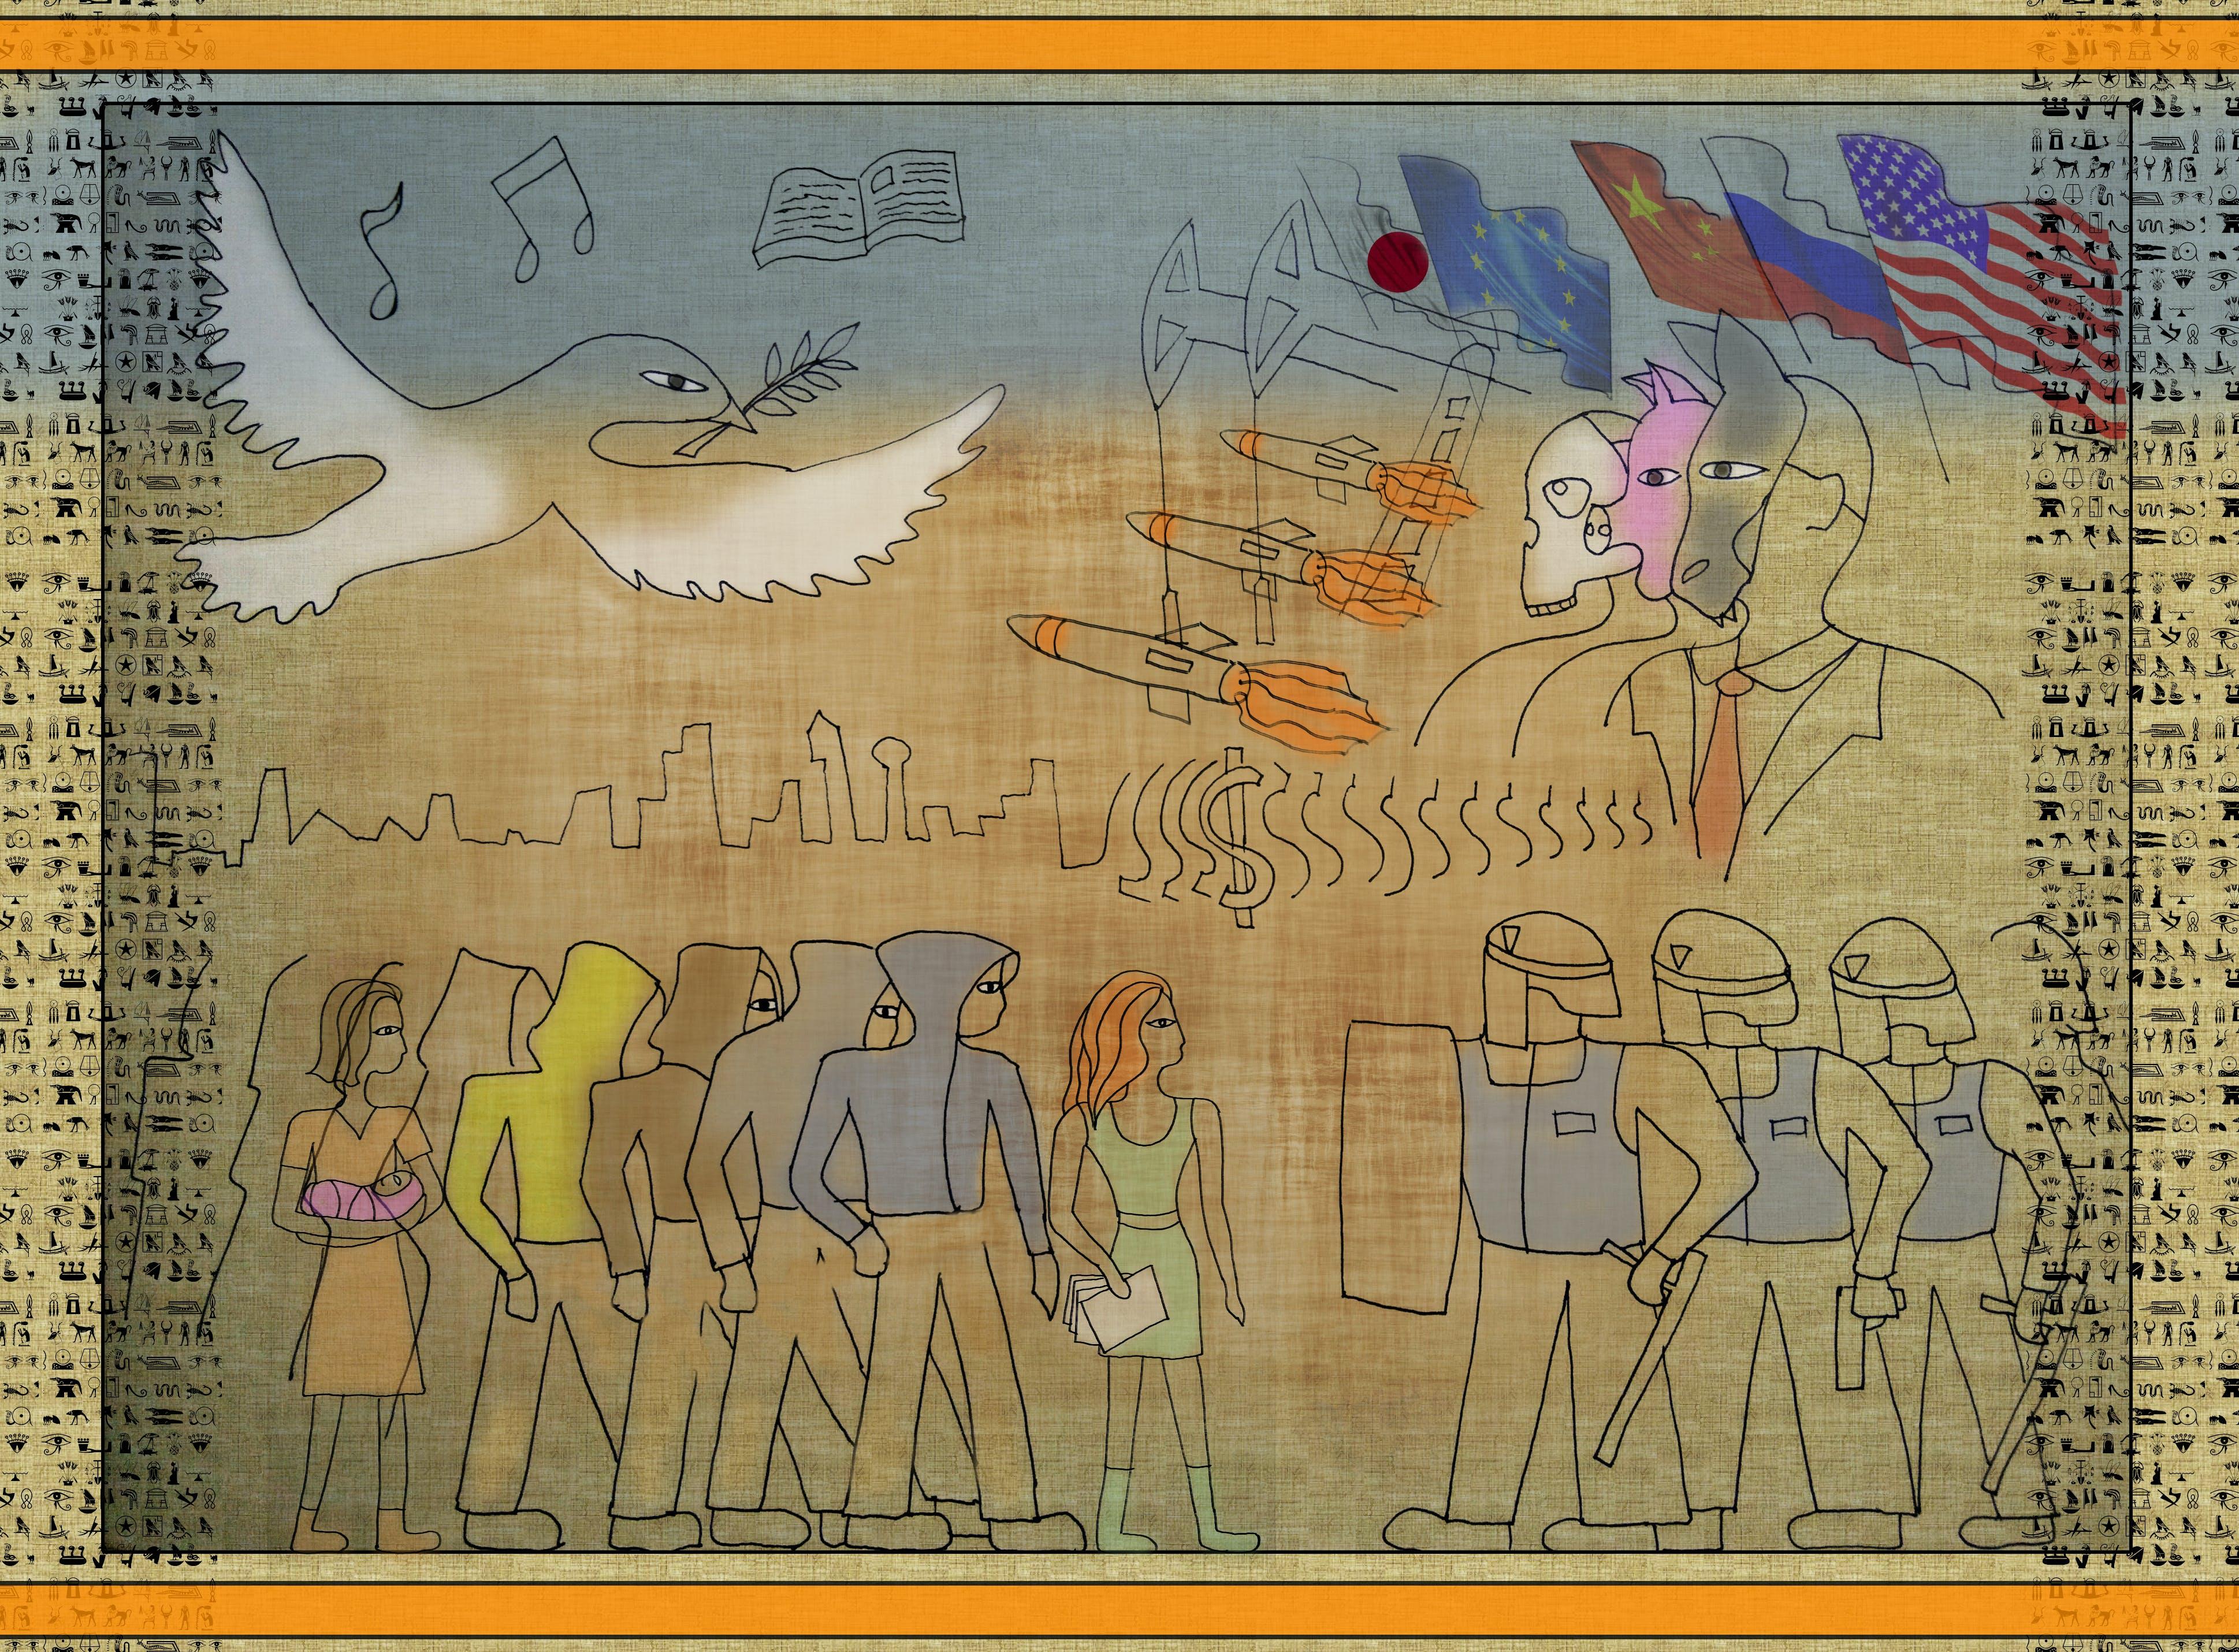 Free stock photo of atomic bomb, Egyptian hieroglyphs, evil, government